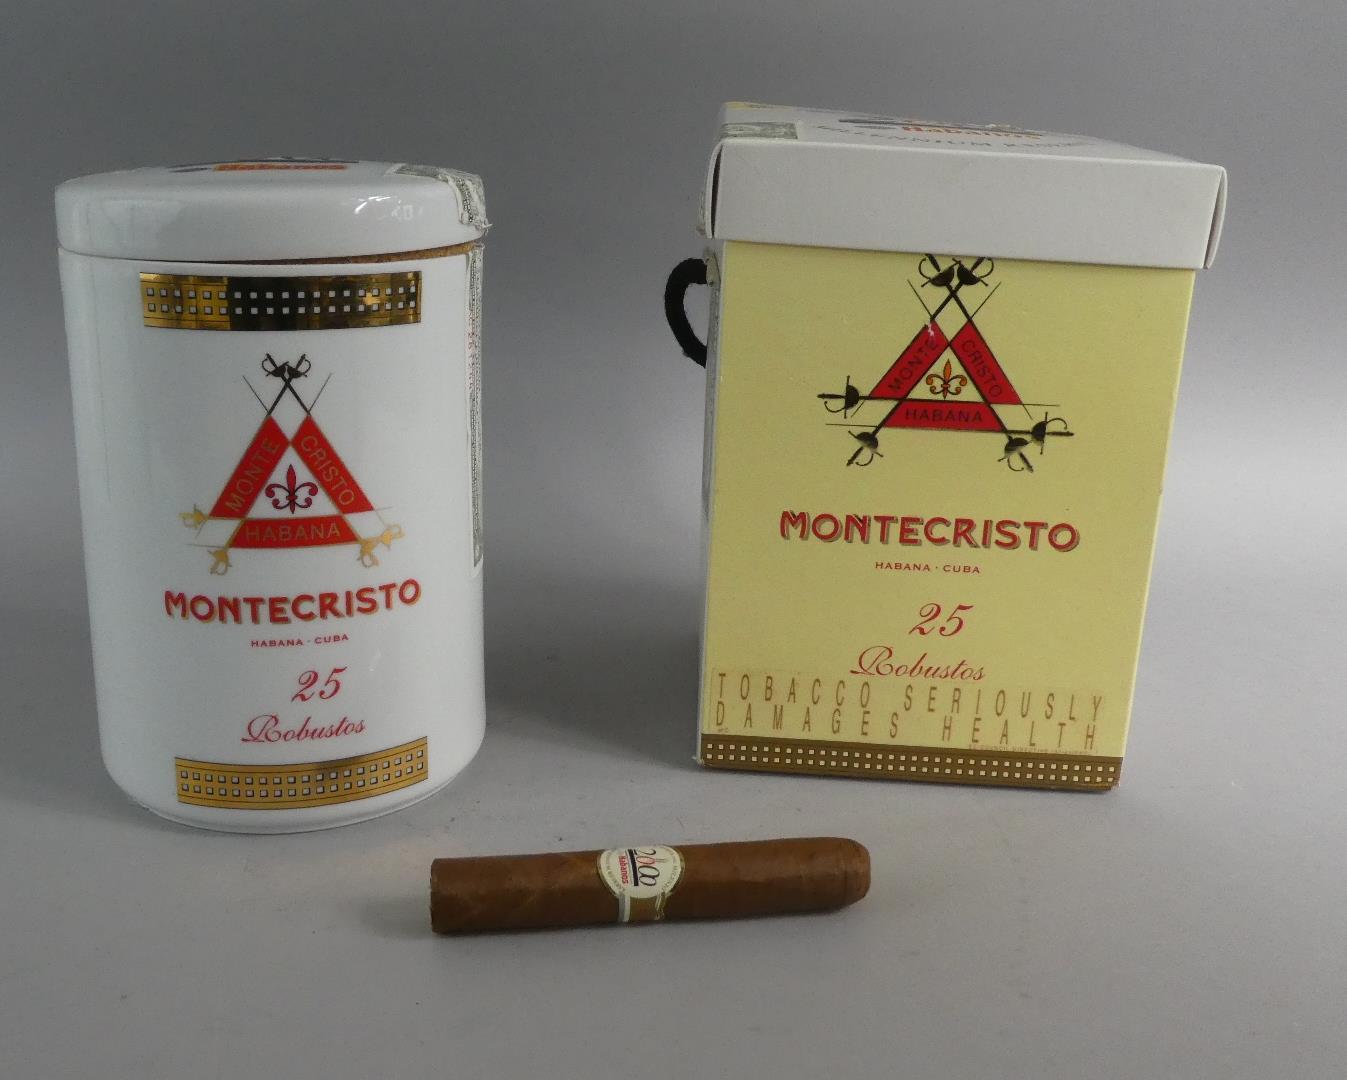 Lot 110 - A Cigar Canister Containing 12 Montecristo Robusto Cuban Cigars with Cardboard Carton